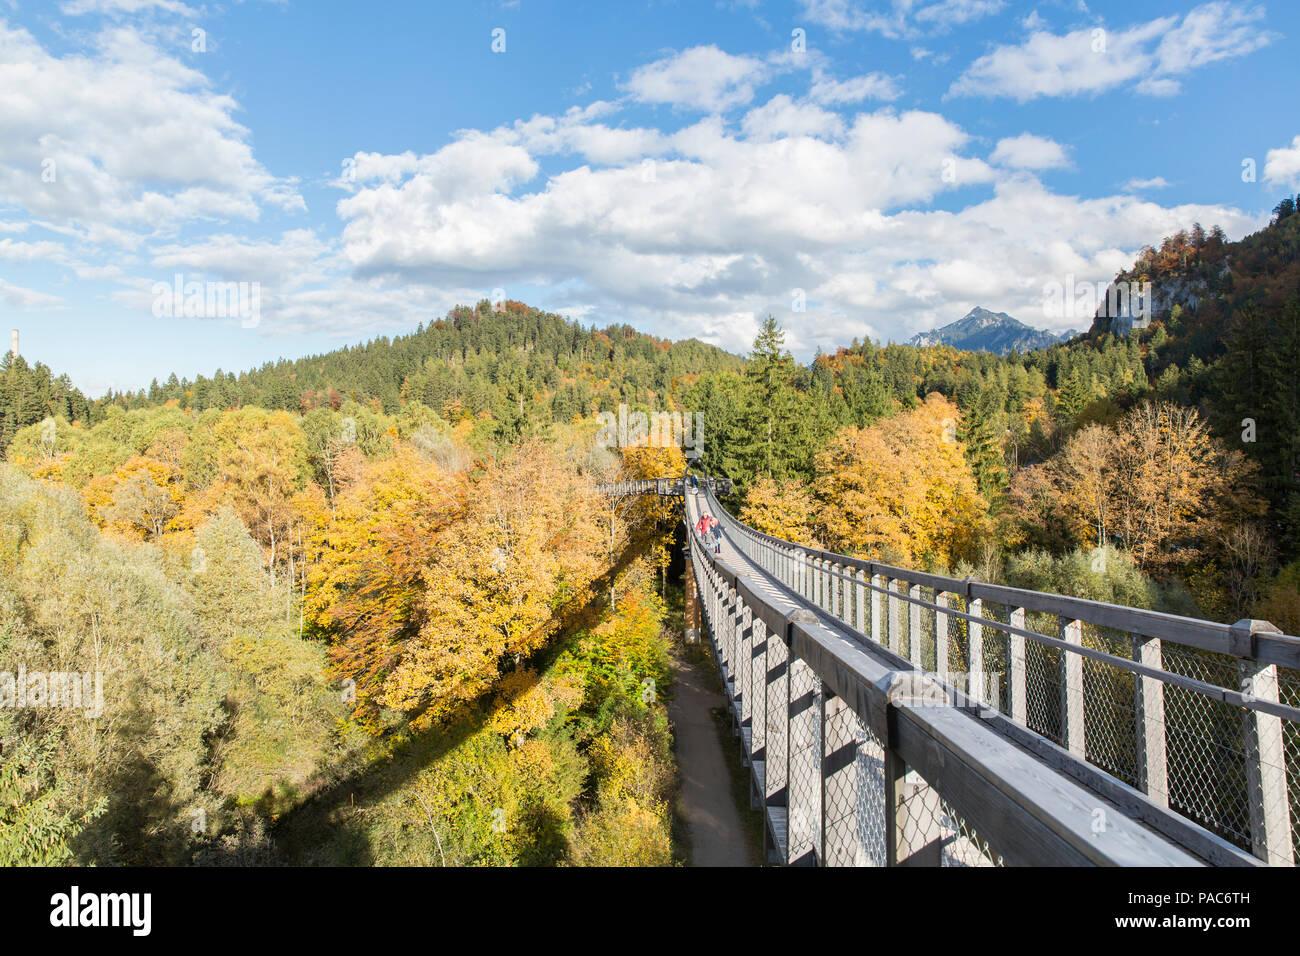 Treetop walk over the autumn forest at Forest Experience Centre Ziegelwiesen, Füssen, Bavaria, Germany Stock Photo